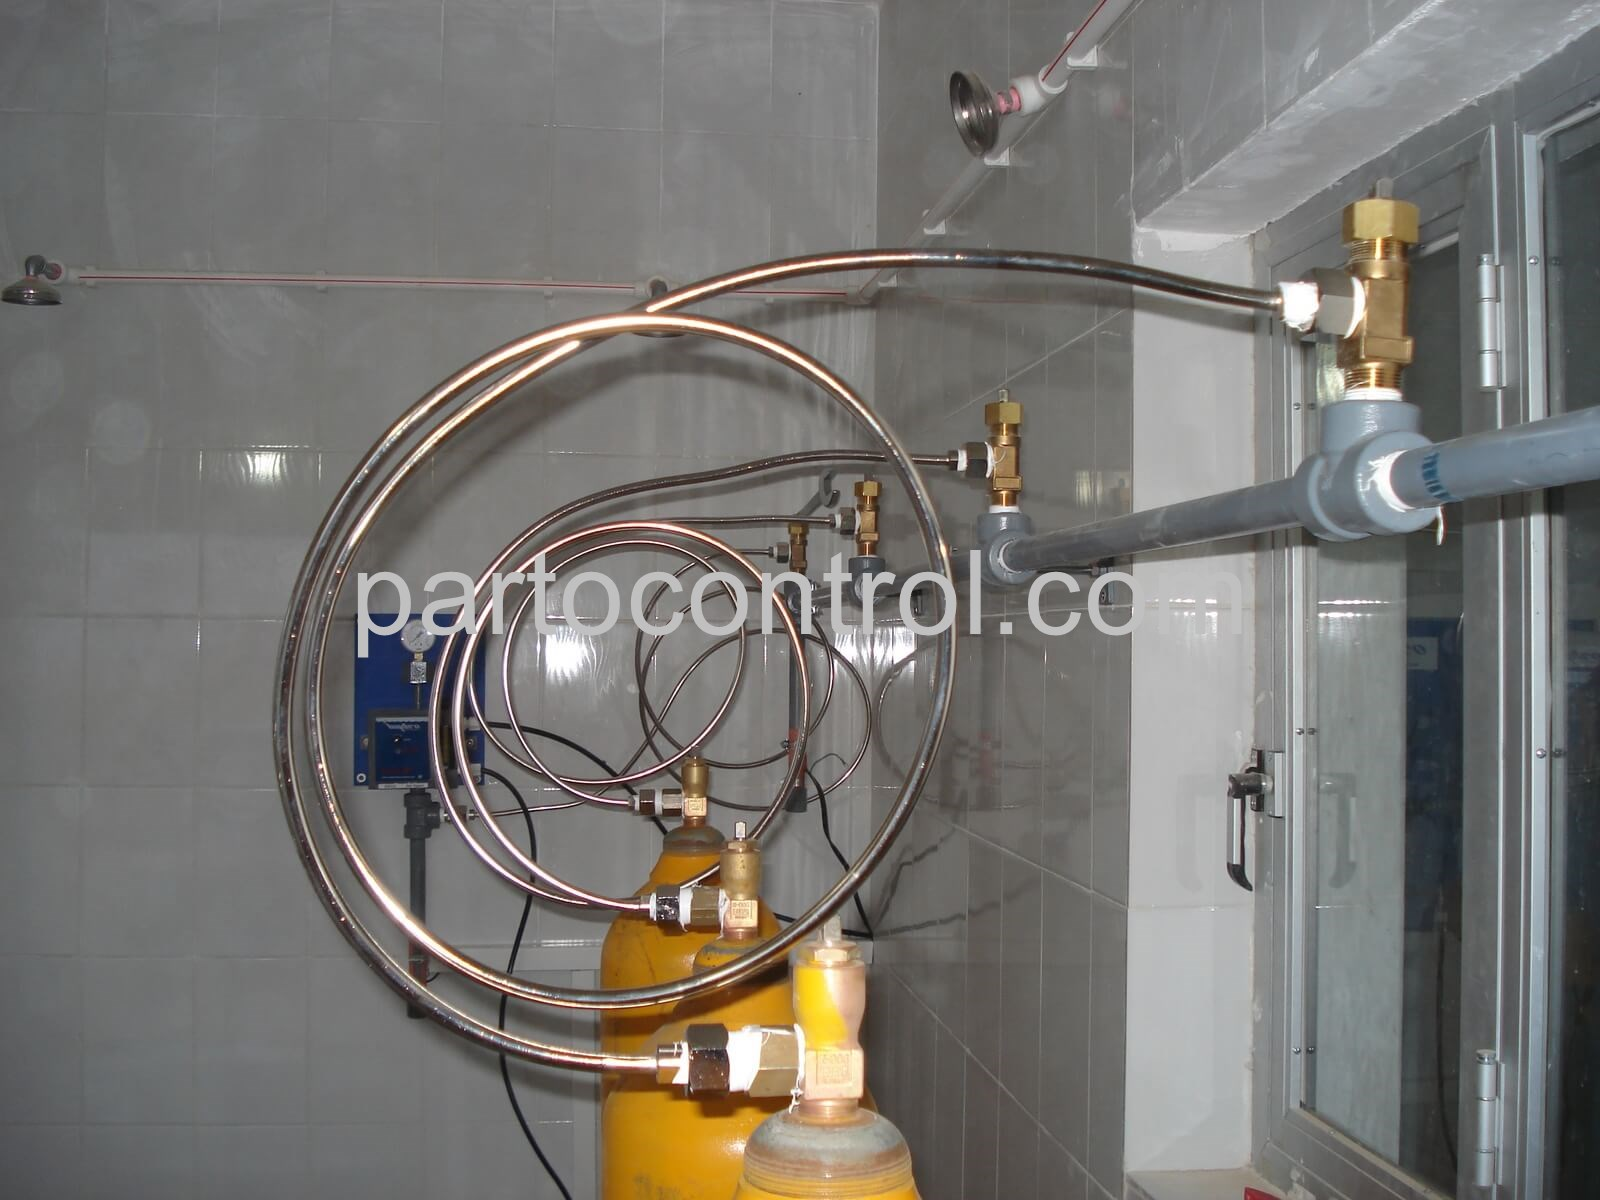 Jarqvia gas chlorineکلرزن گازی ابرسانی جرقویه2 - پروژه کلرزن گازی